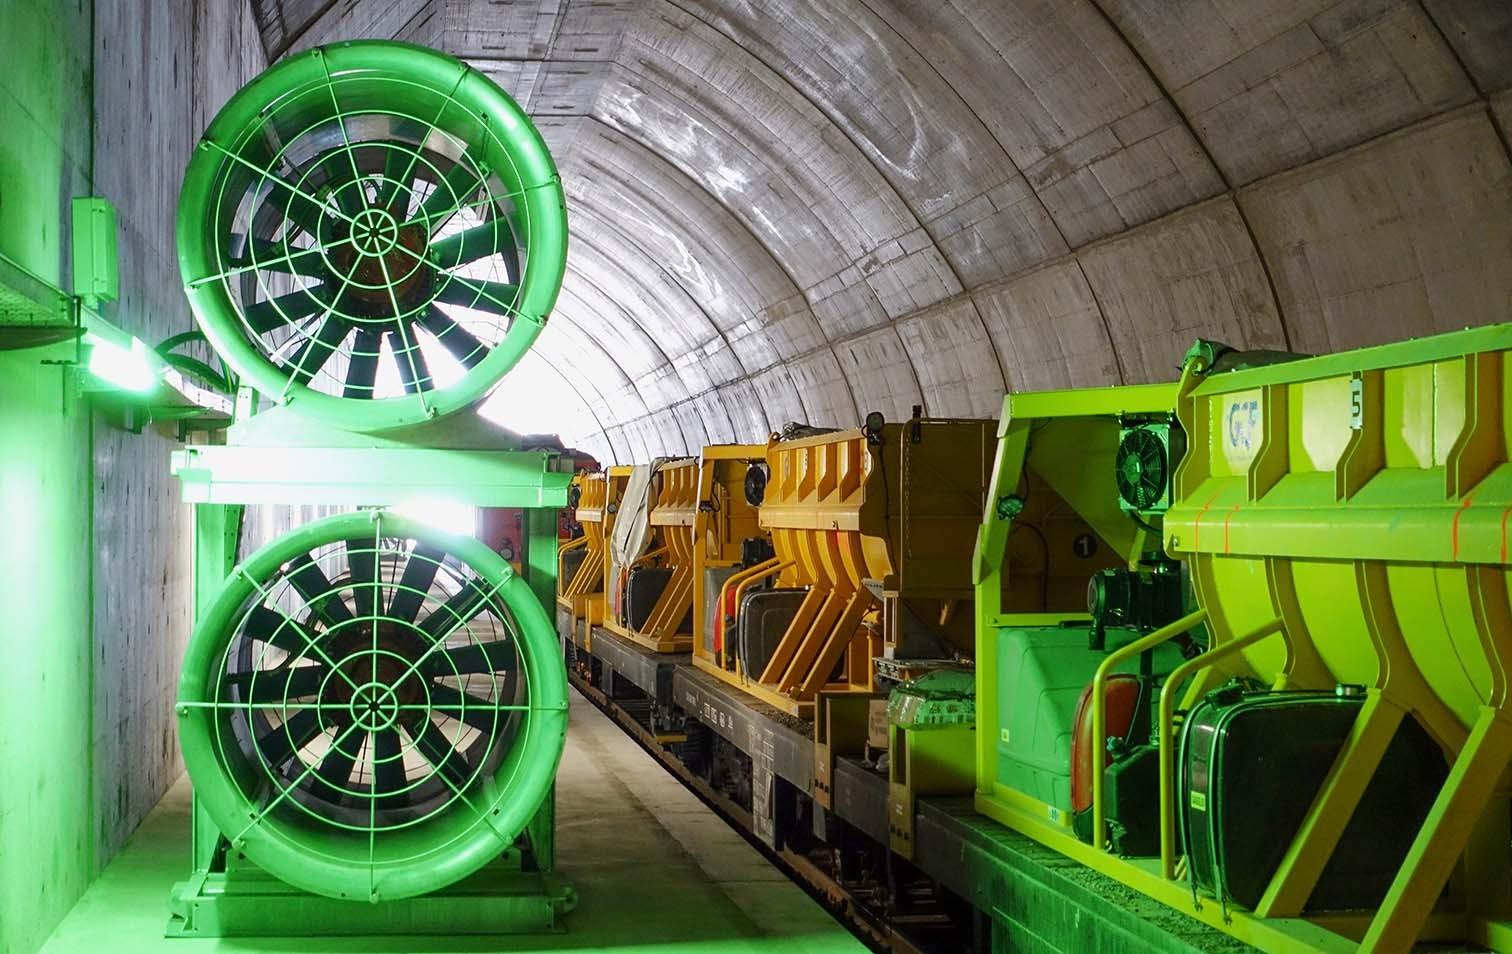 Betonzug im Ceneri-Basistunnel